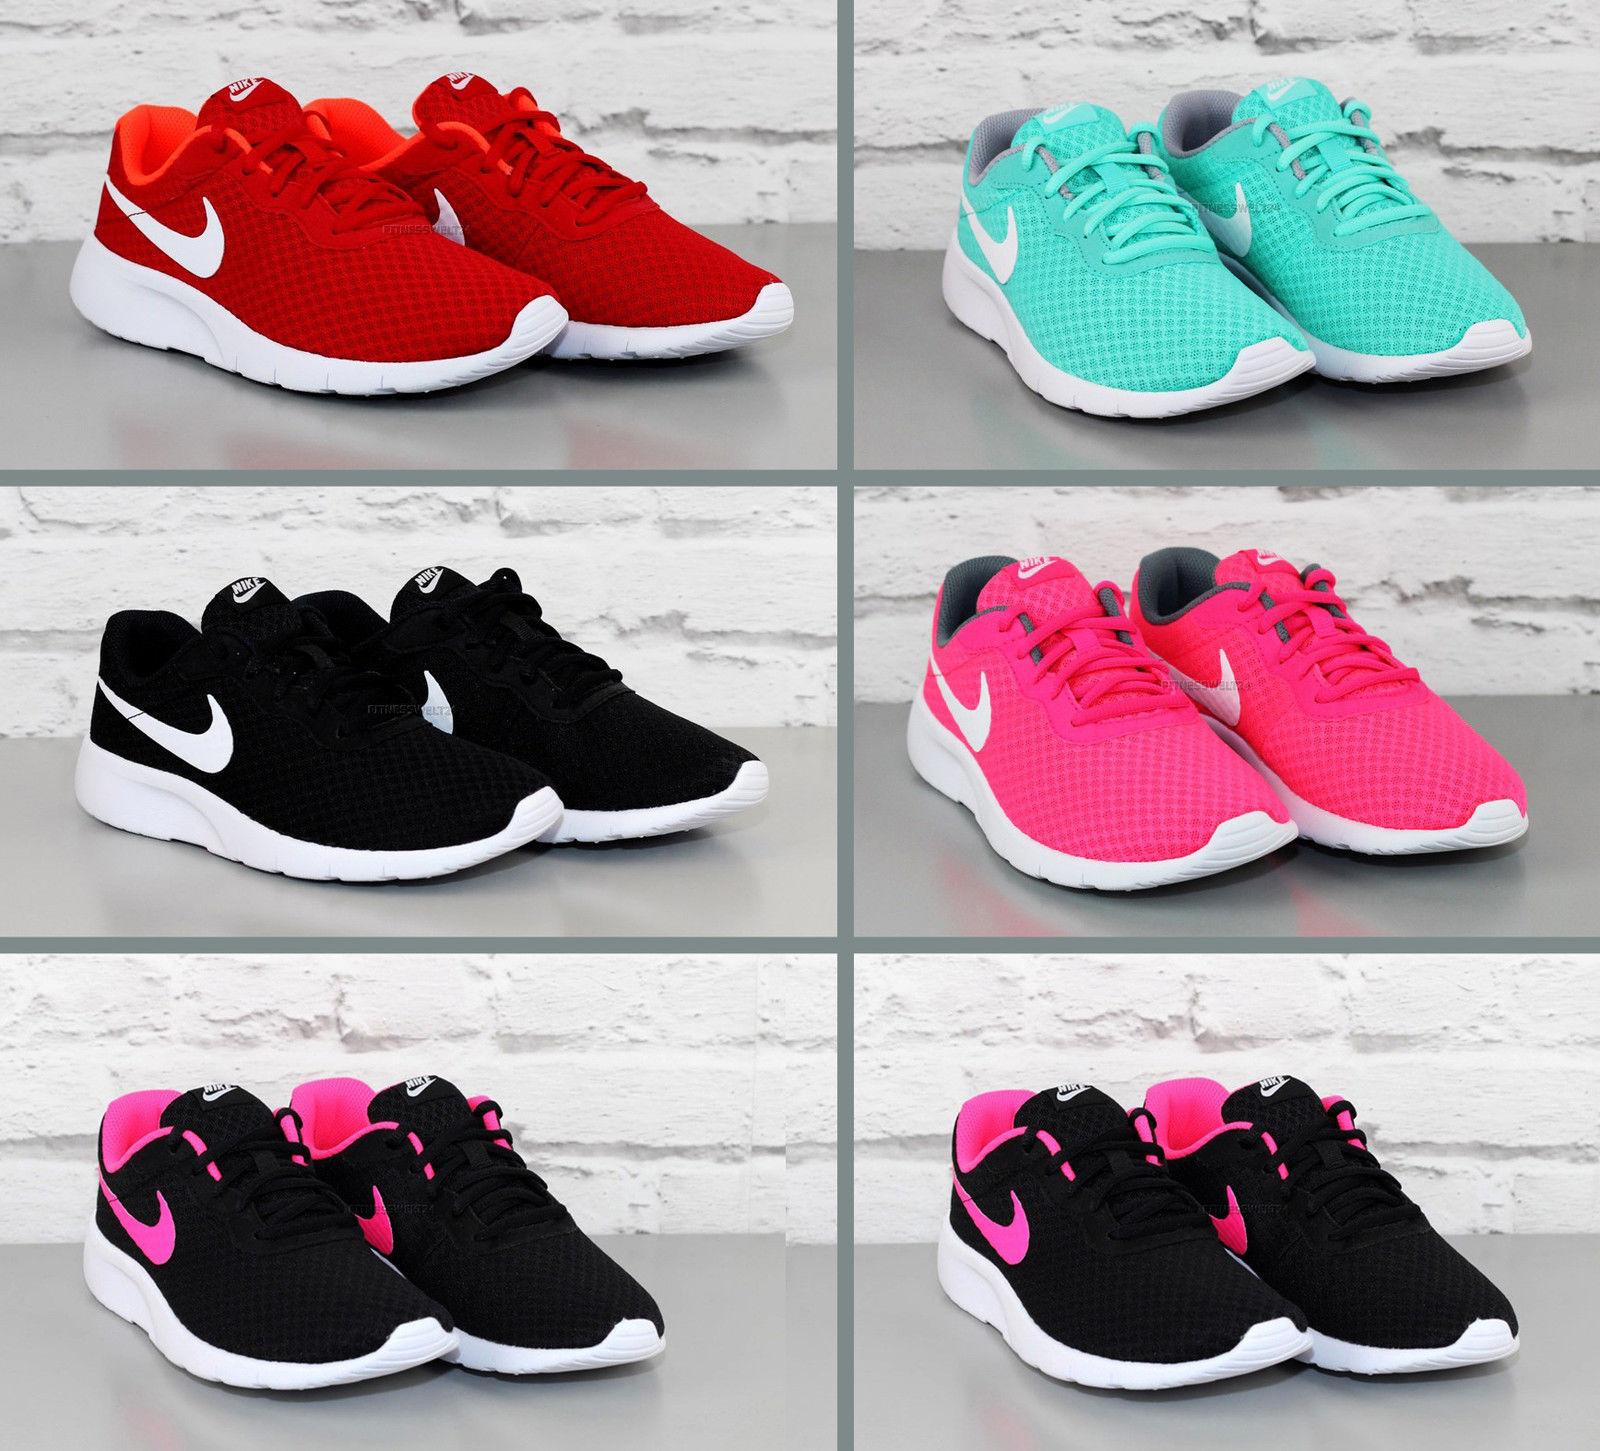 Zapatillas deportivas Nike 818381 TANJUN GS DEPORTIVO de